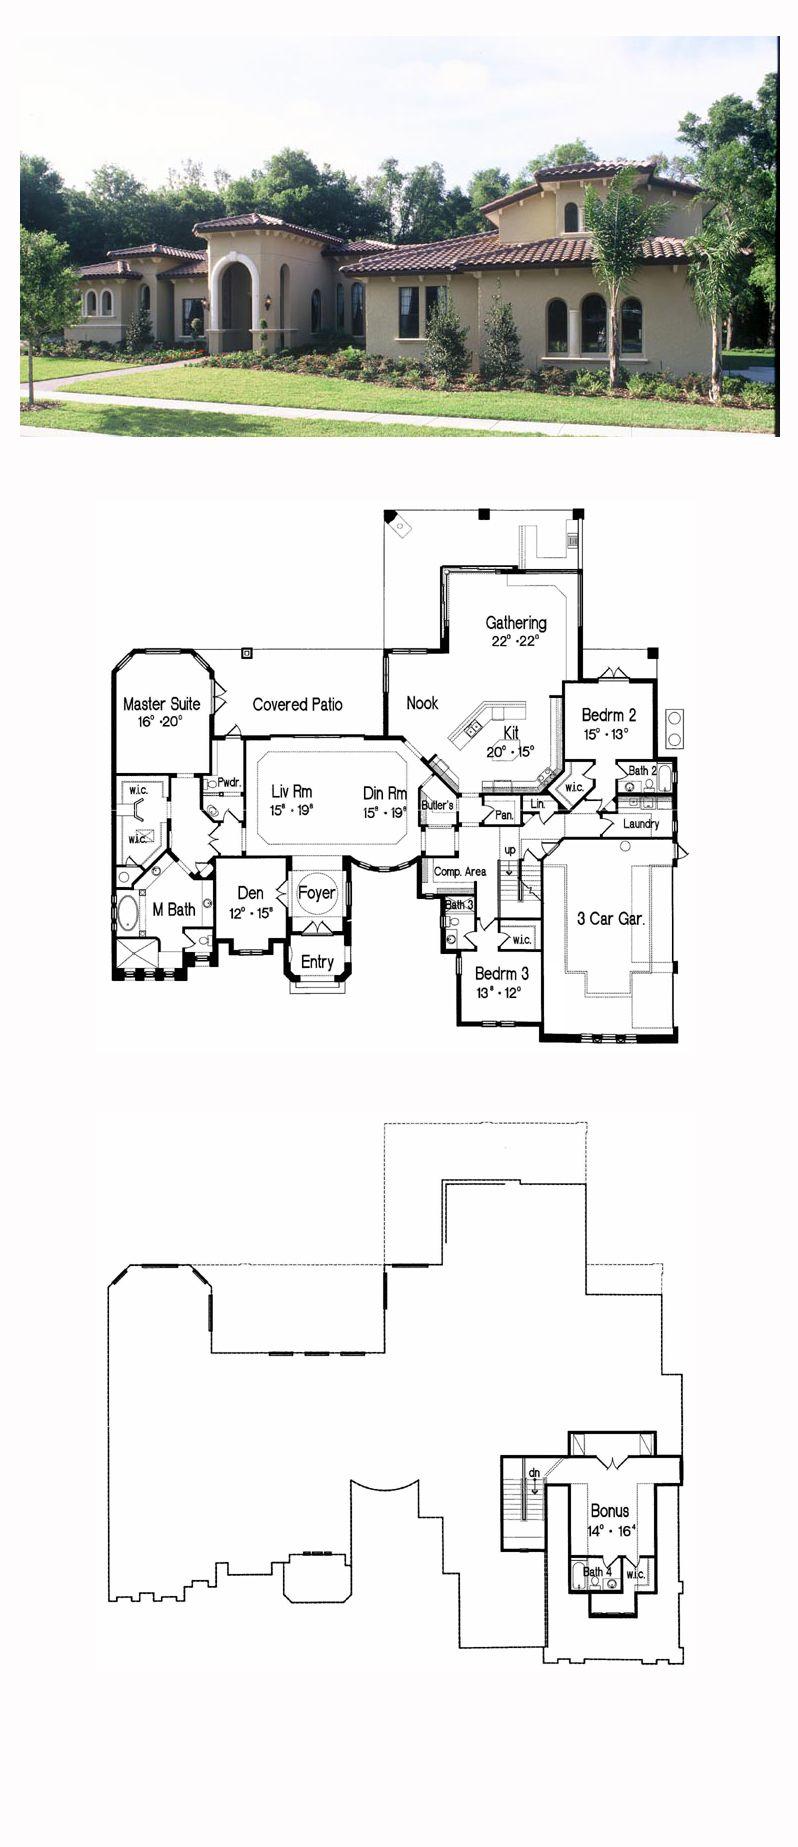 Italian house plan total living area sq ft